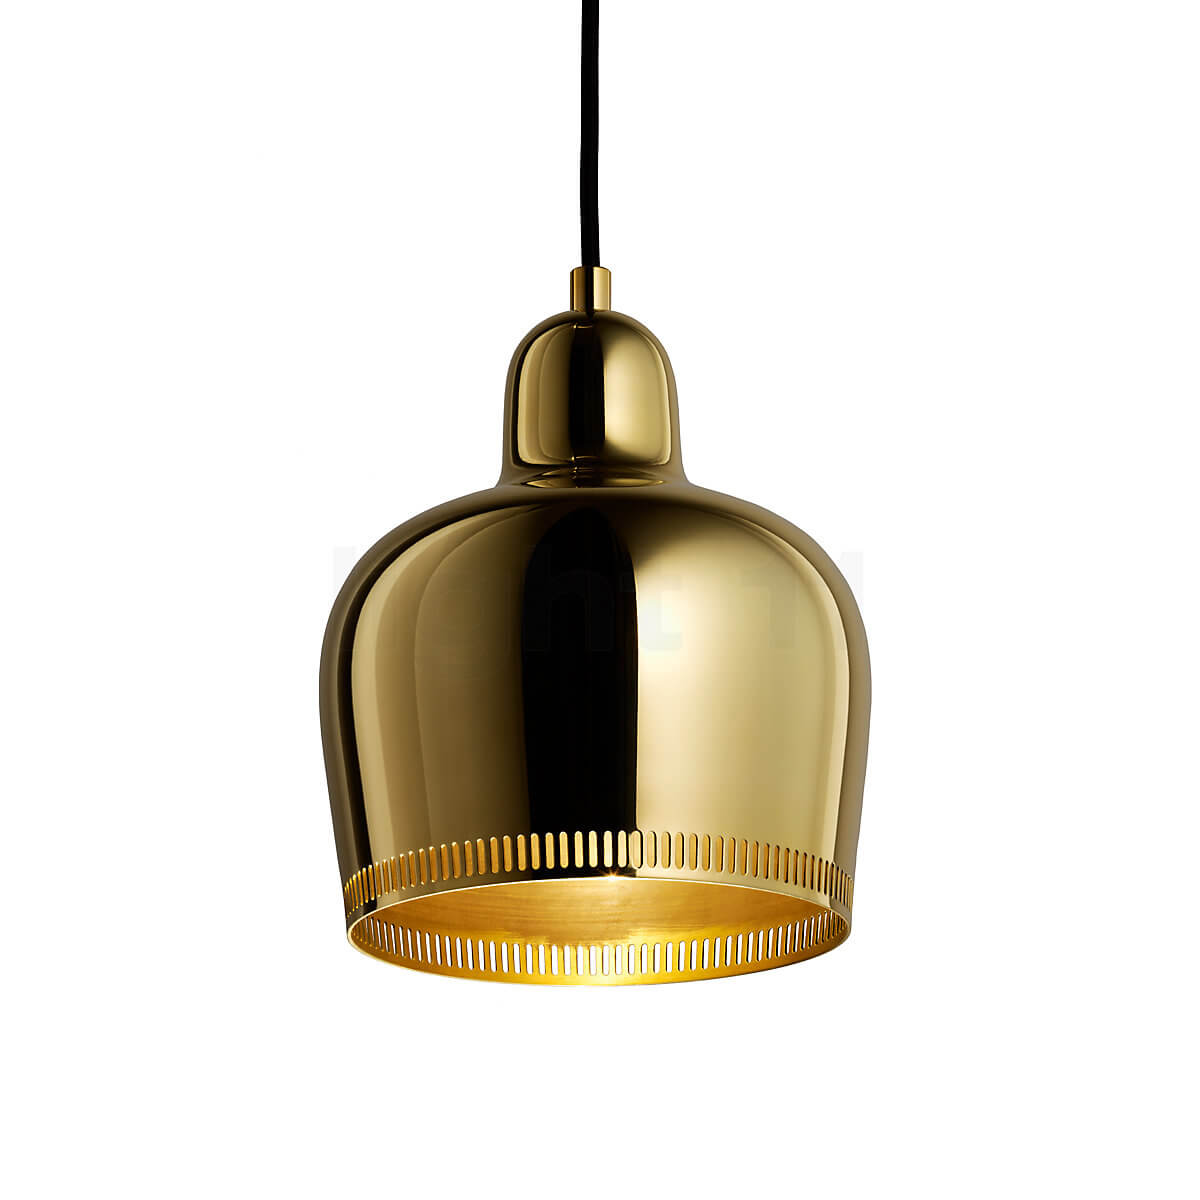 Golden Bell Lamp